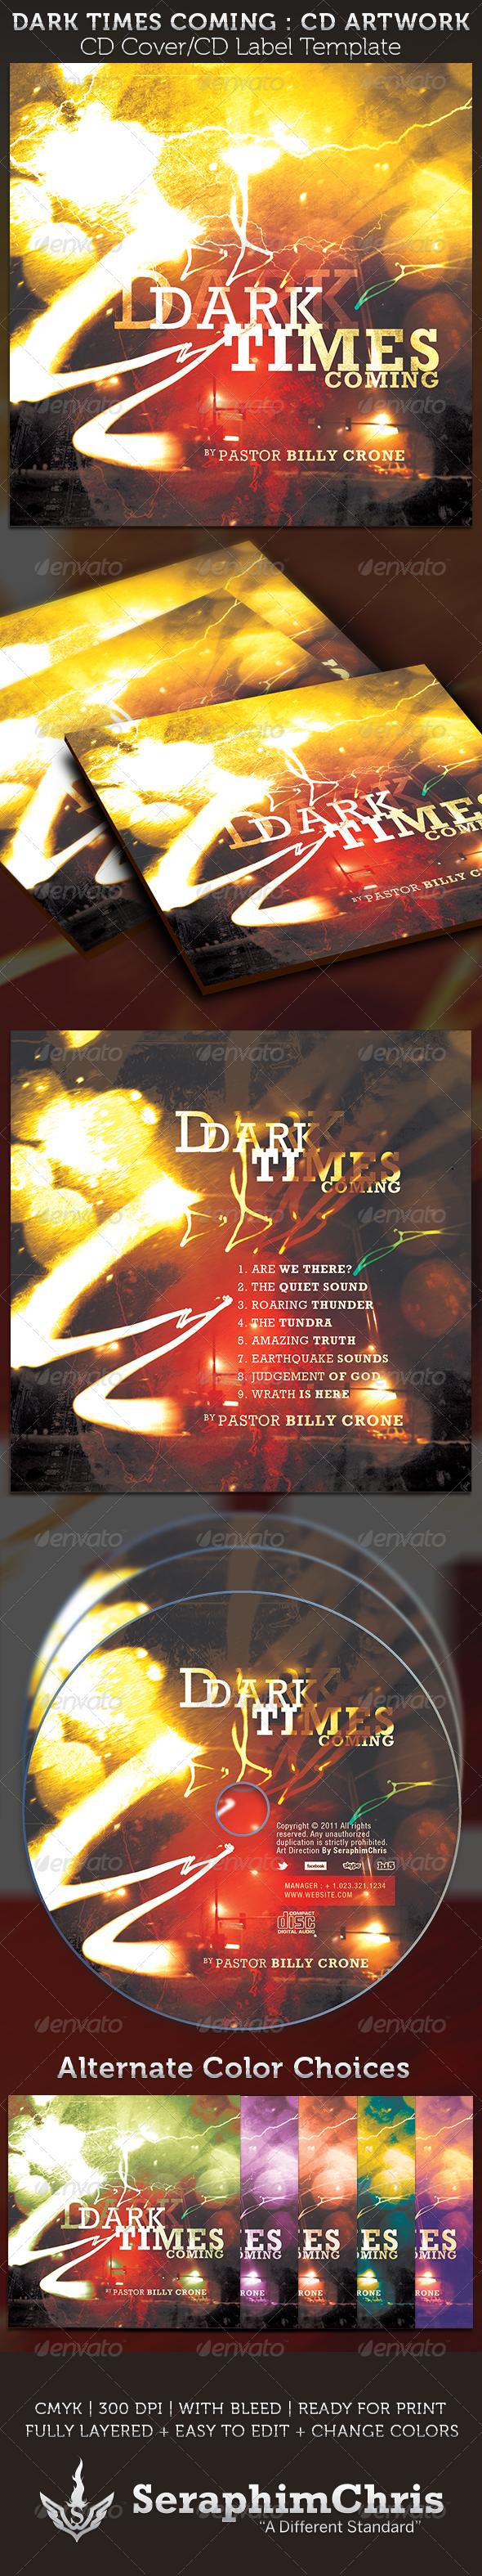 Dark Times Coming CD Cover Artwork Template - CD & DVD Artwork Print Templates